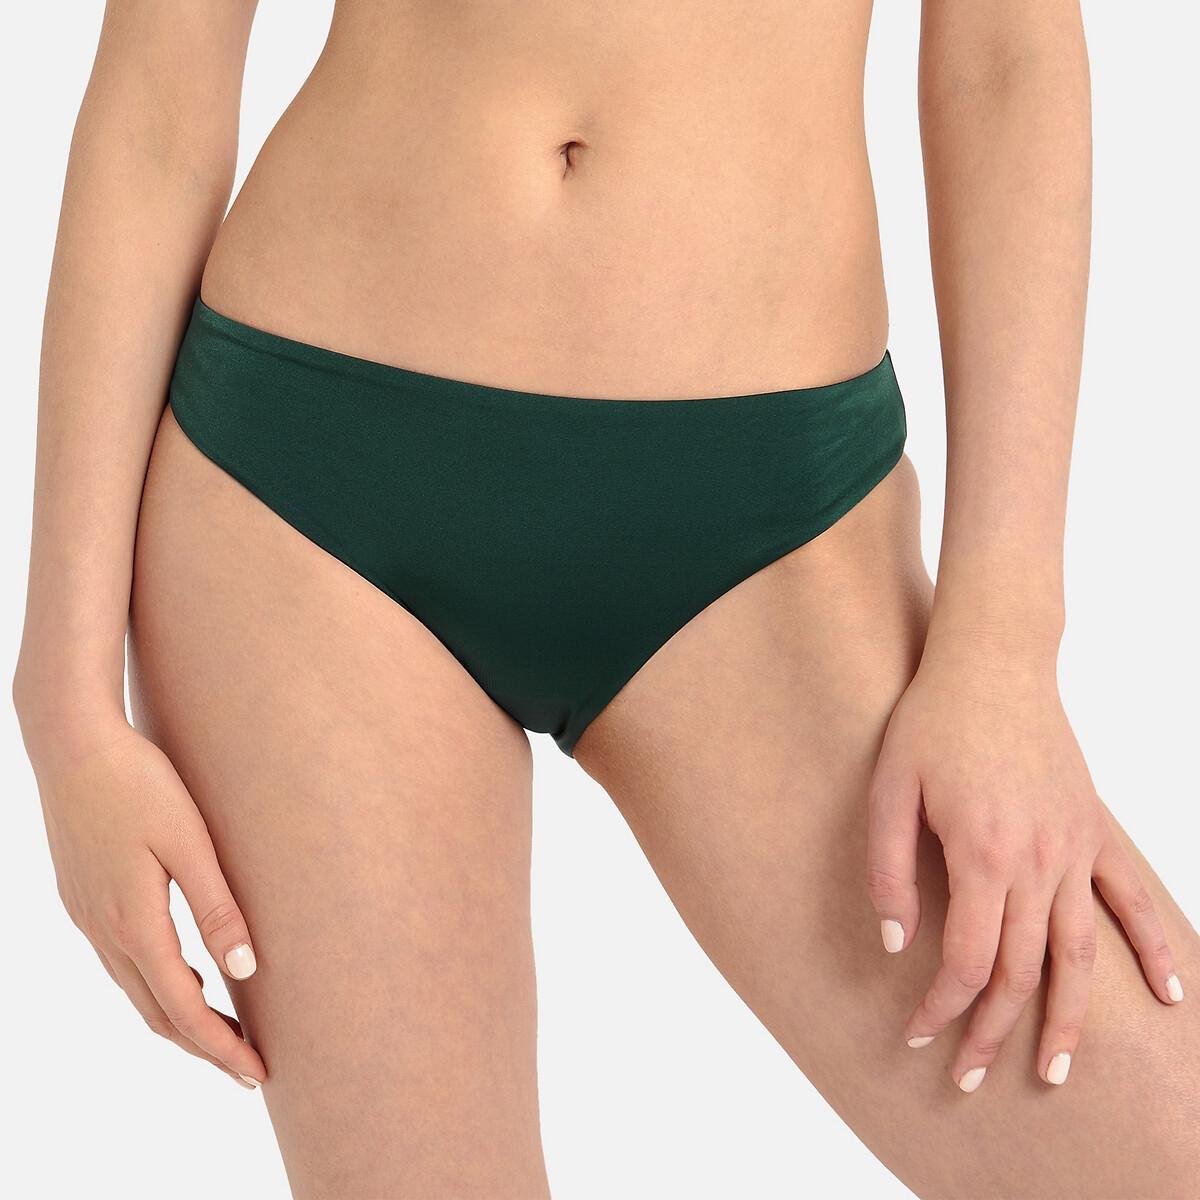 Плавки LaRedoute От купальника форма бикини 36 (FR) - 42 (RUS) зеленый